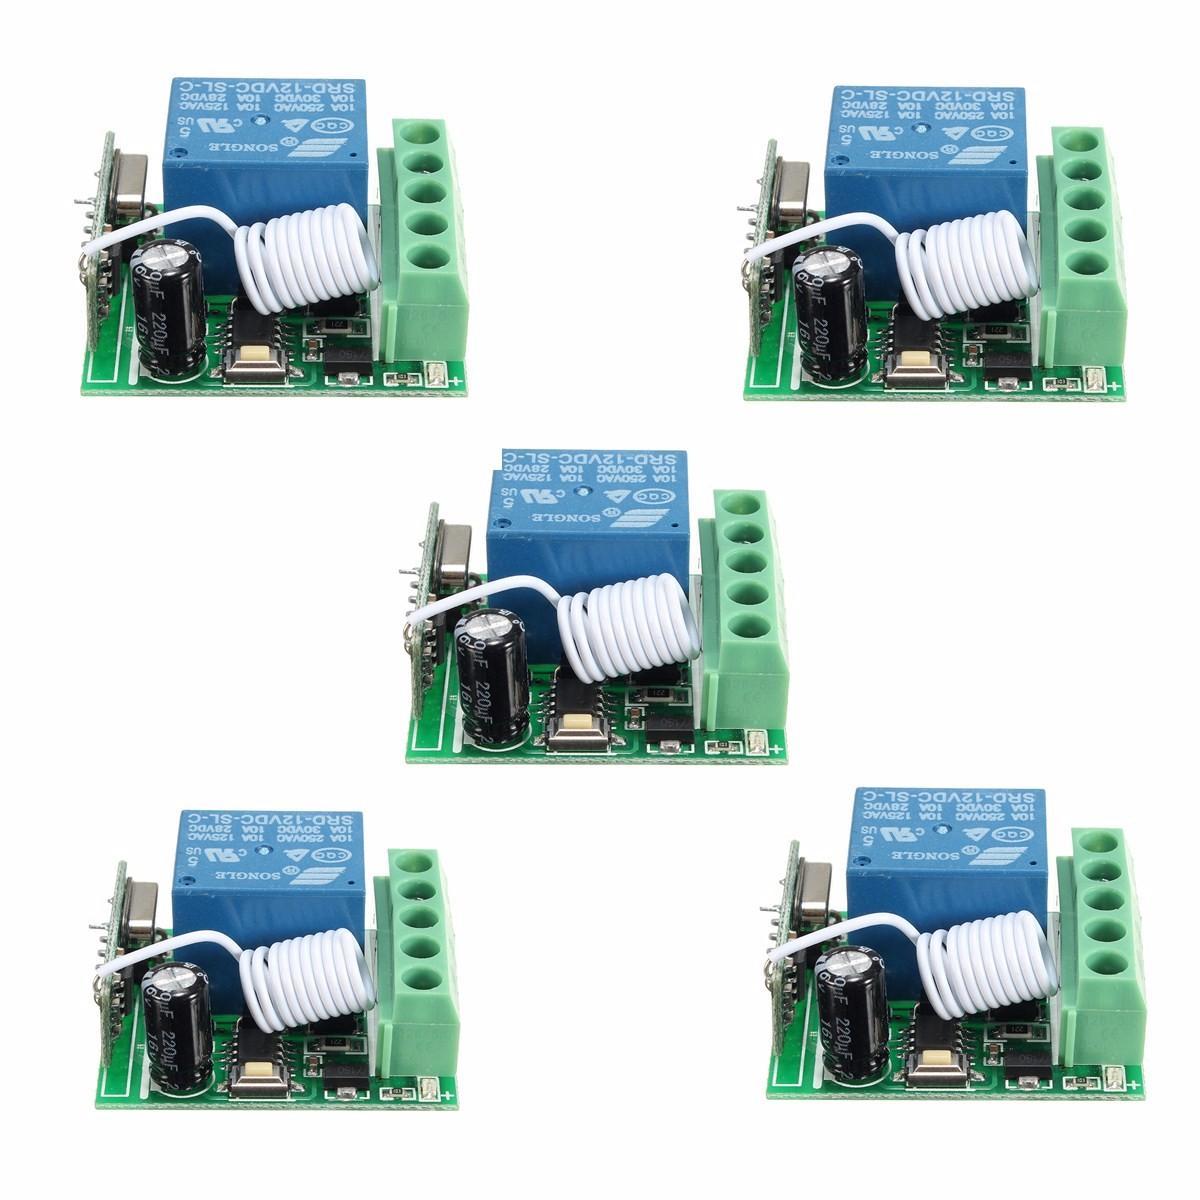 5Pcs DC12V 10A 1CH 433MHz Wireless Relay RF Remote Control Switch Receiver